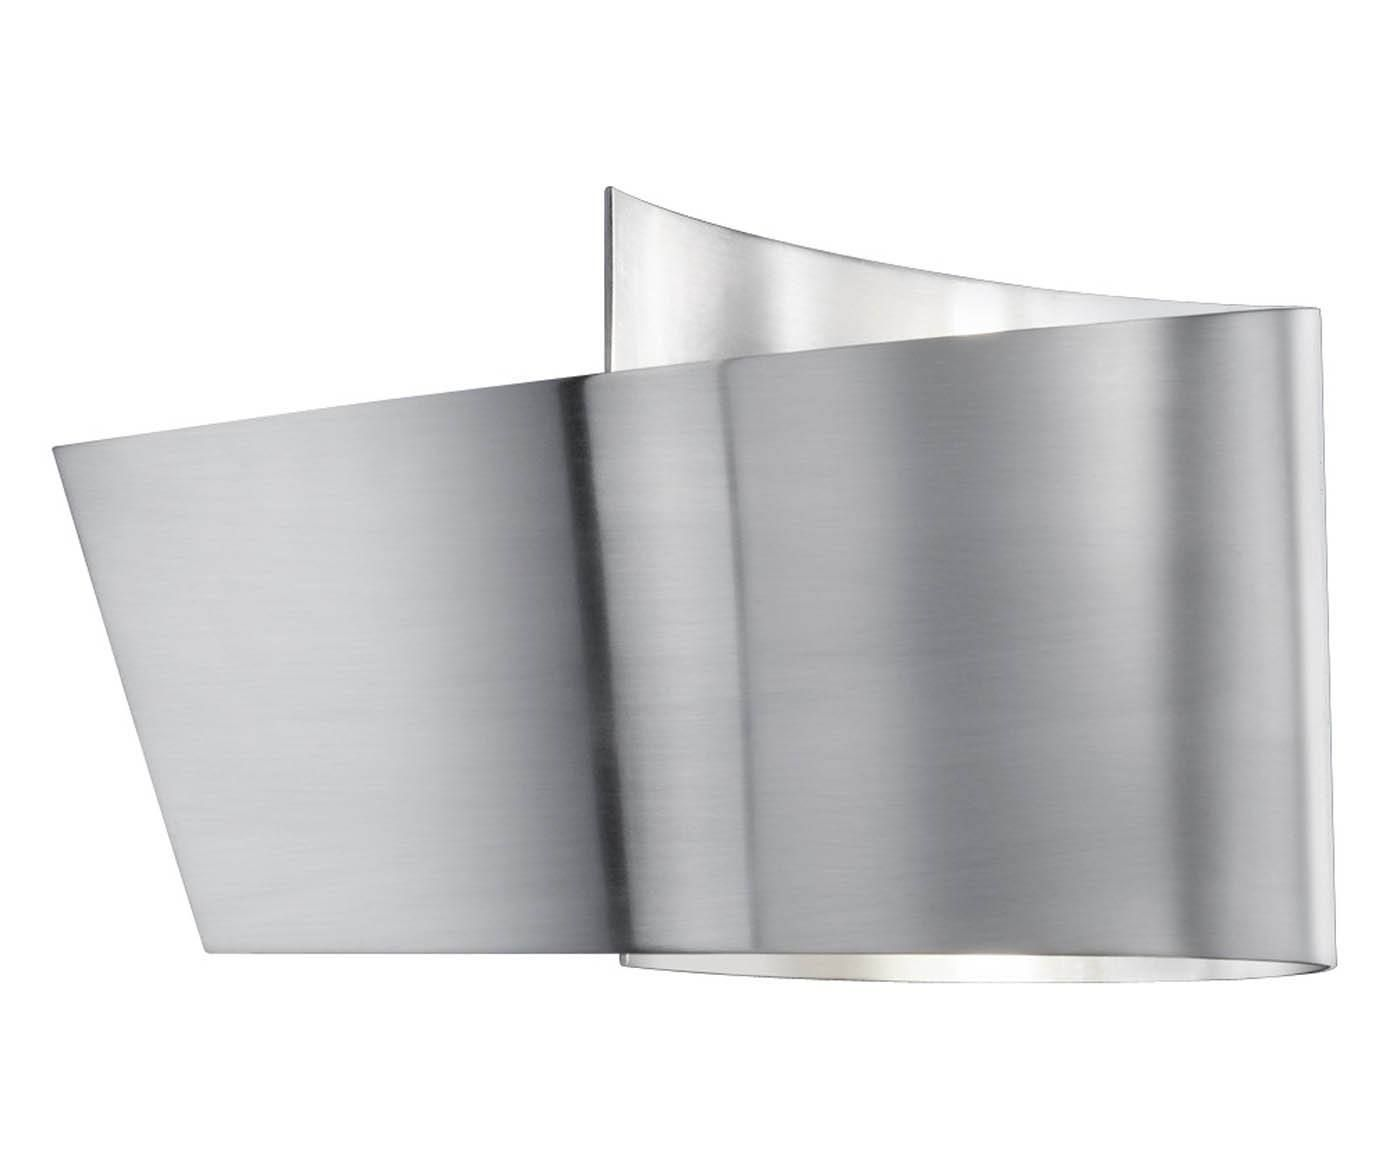 Applique a led in metallo virgola nichel opaco 20x12x9 cm dalani